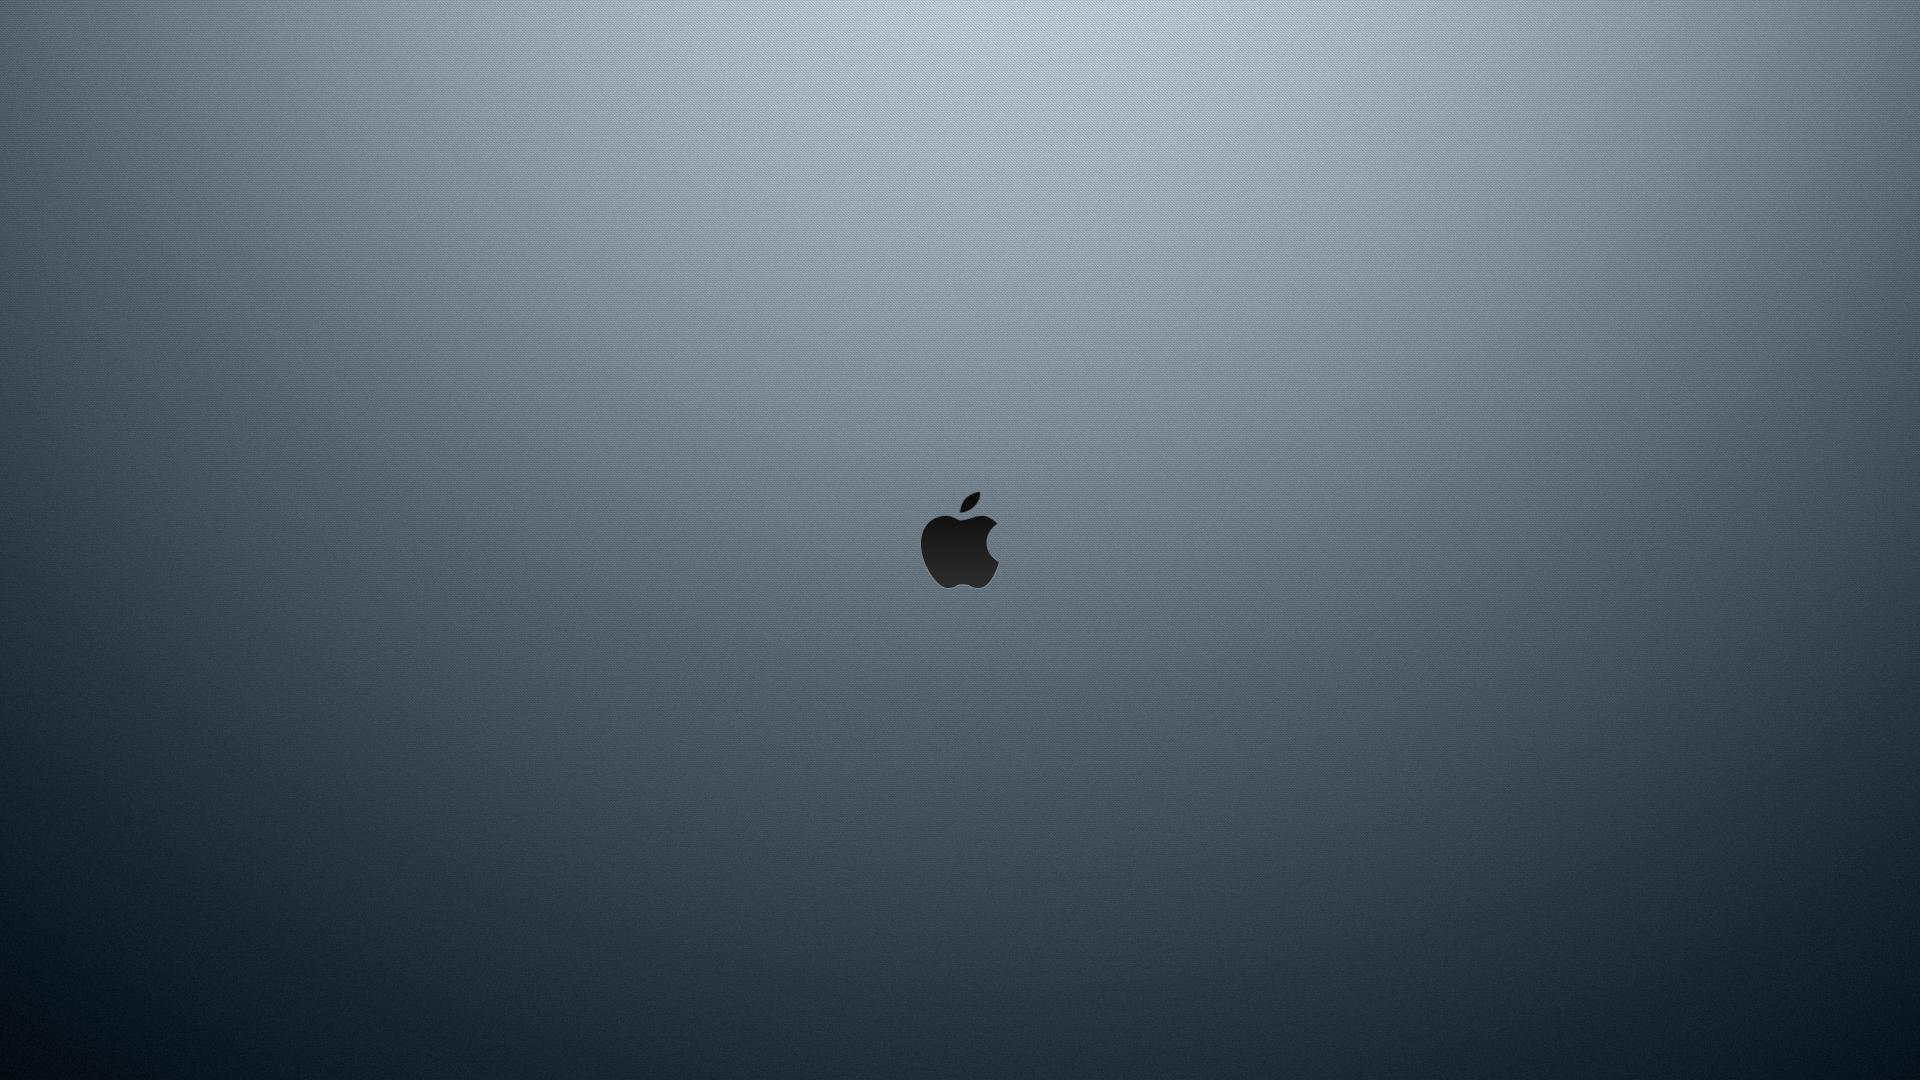 mac wallpapers desktop wallpaper - photo #28